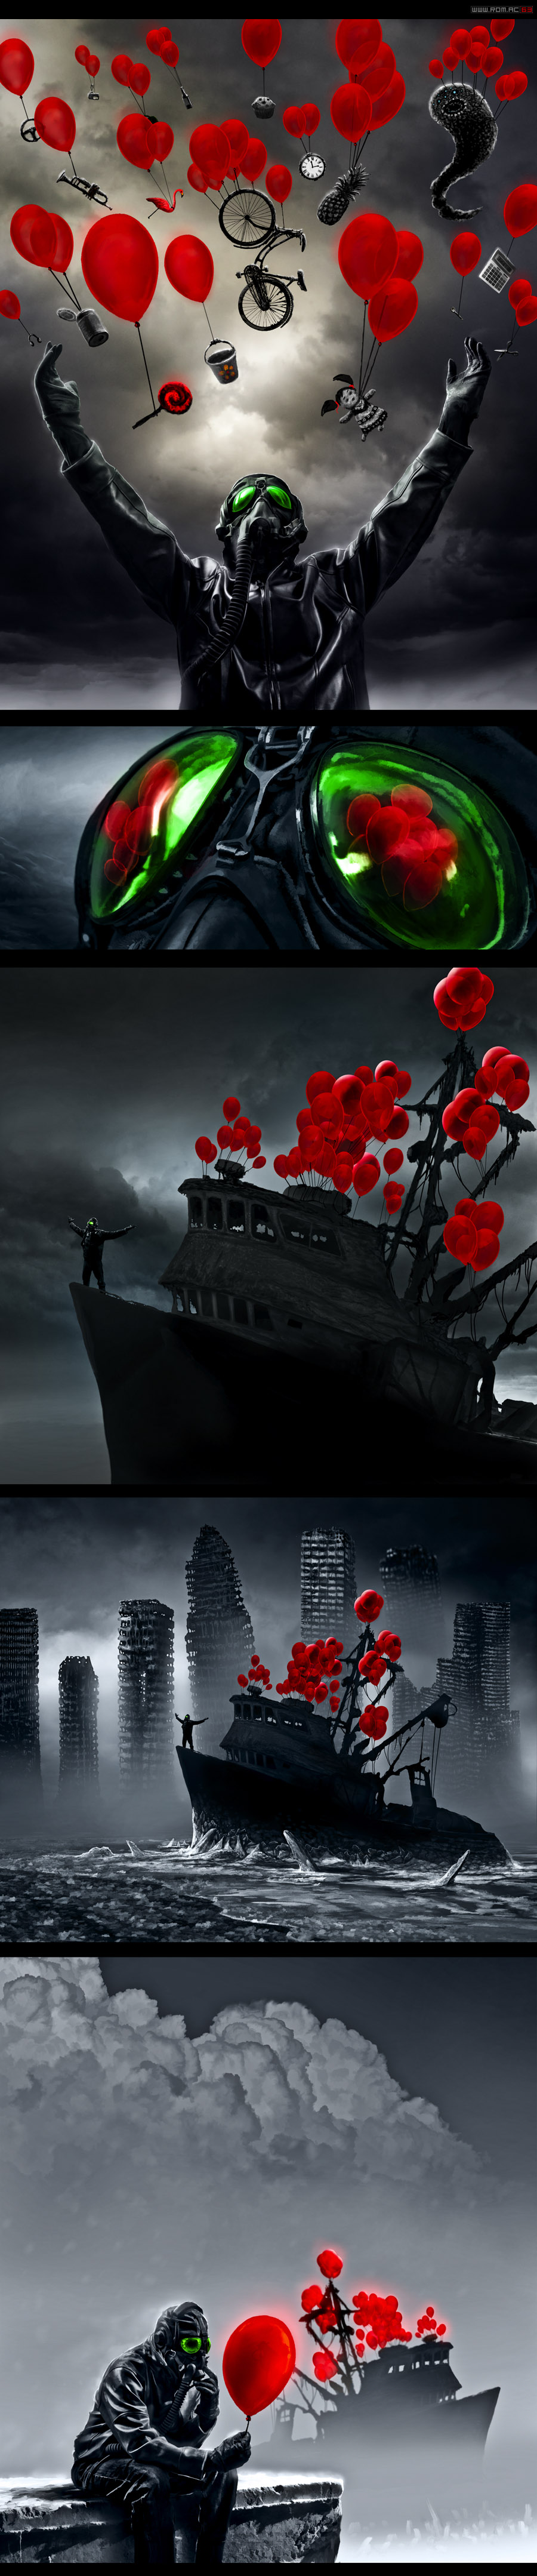 Romantically Apocalyptic 63 by alexiuss